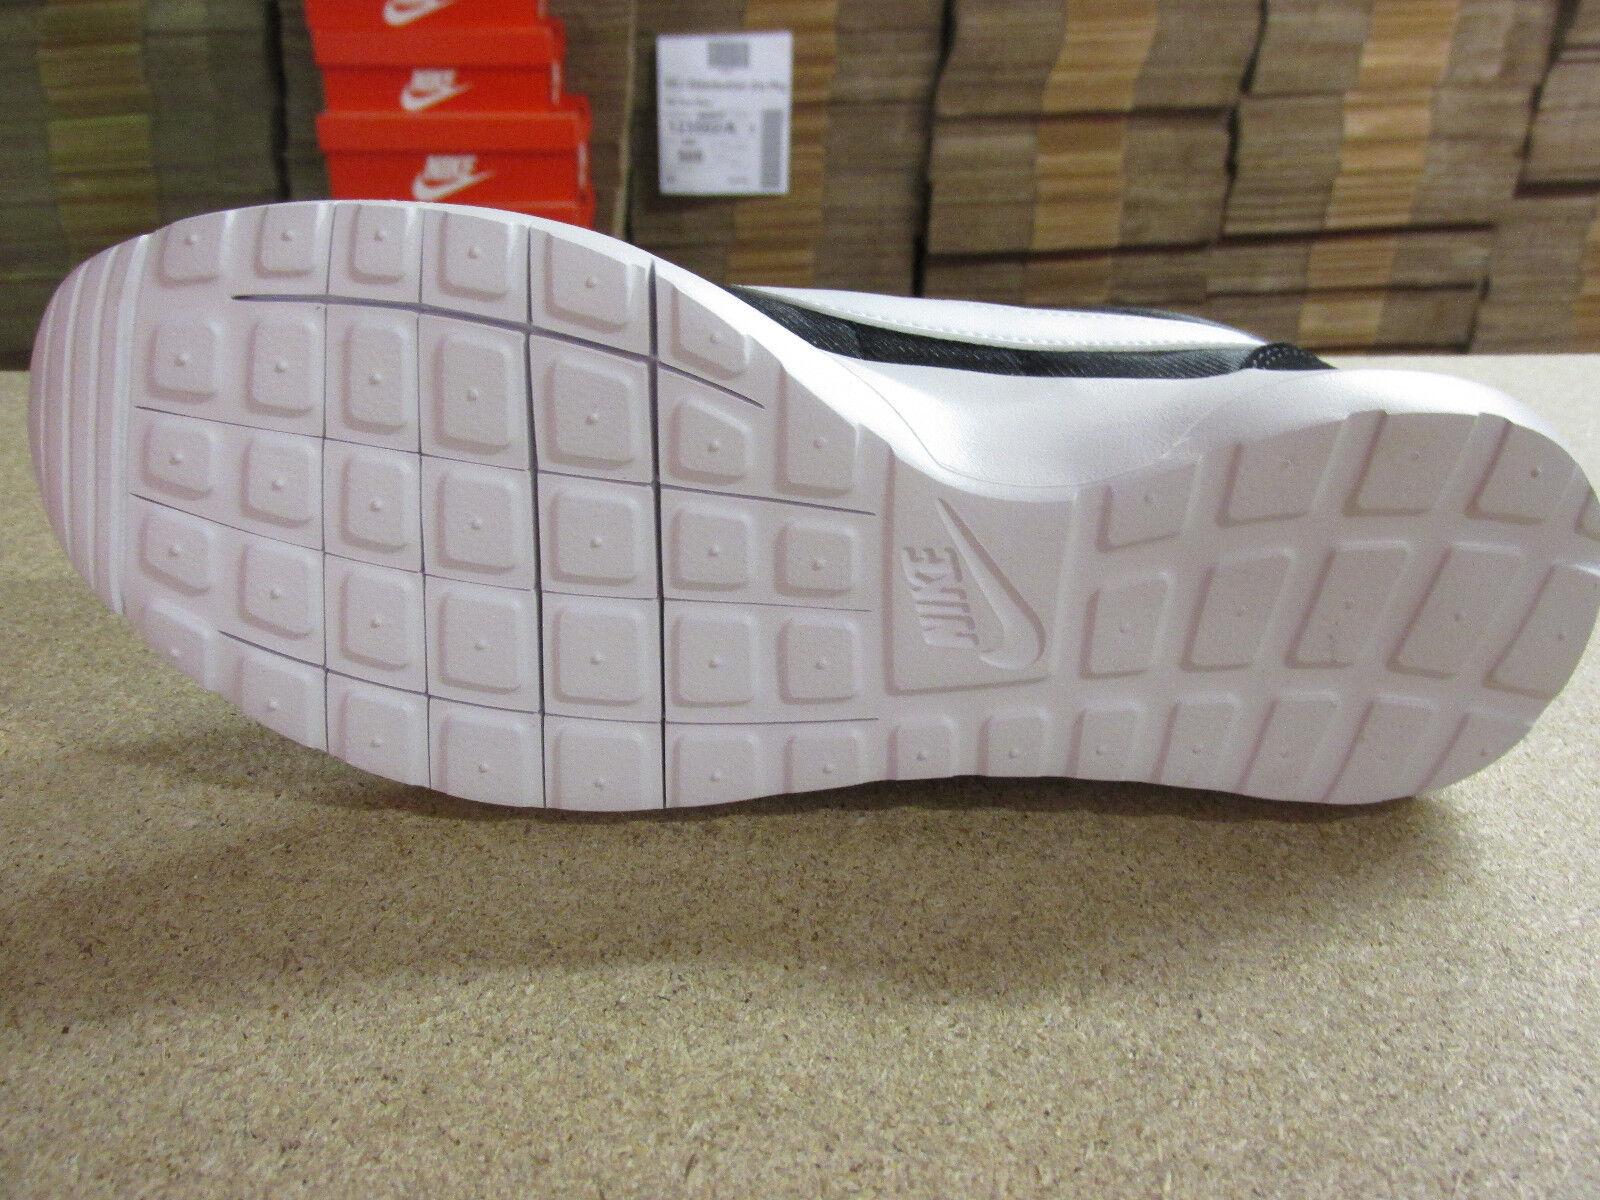 Nike Damen Turnschuhe Roshe LD-1000 Turnschuhe Damen 819843 001 Turnschuhe 6c865d